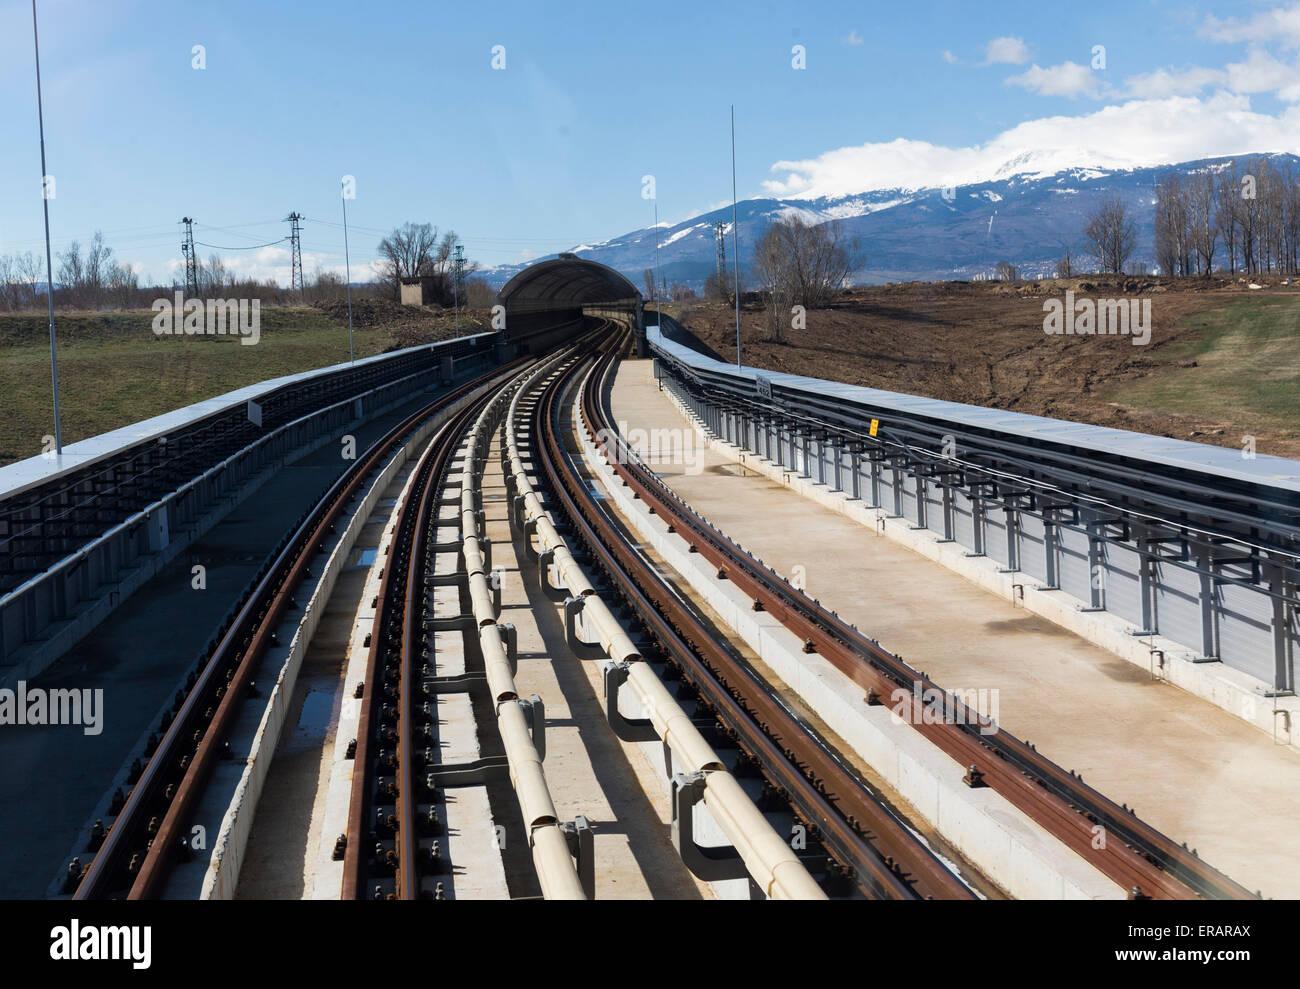 Subway train platform. Train's point of view. - Stock Image